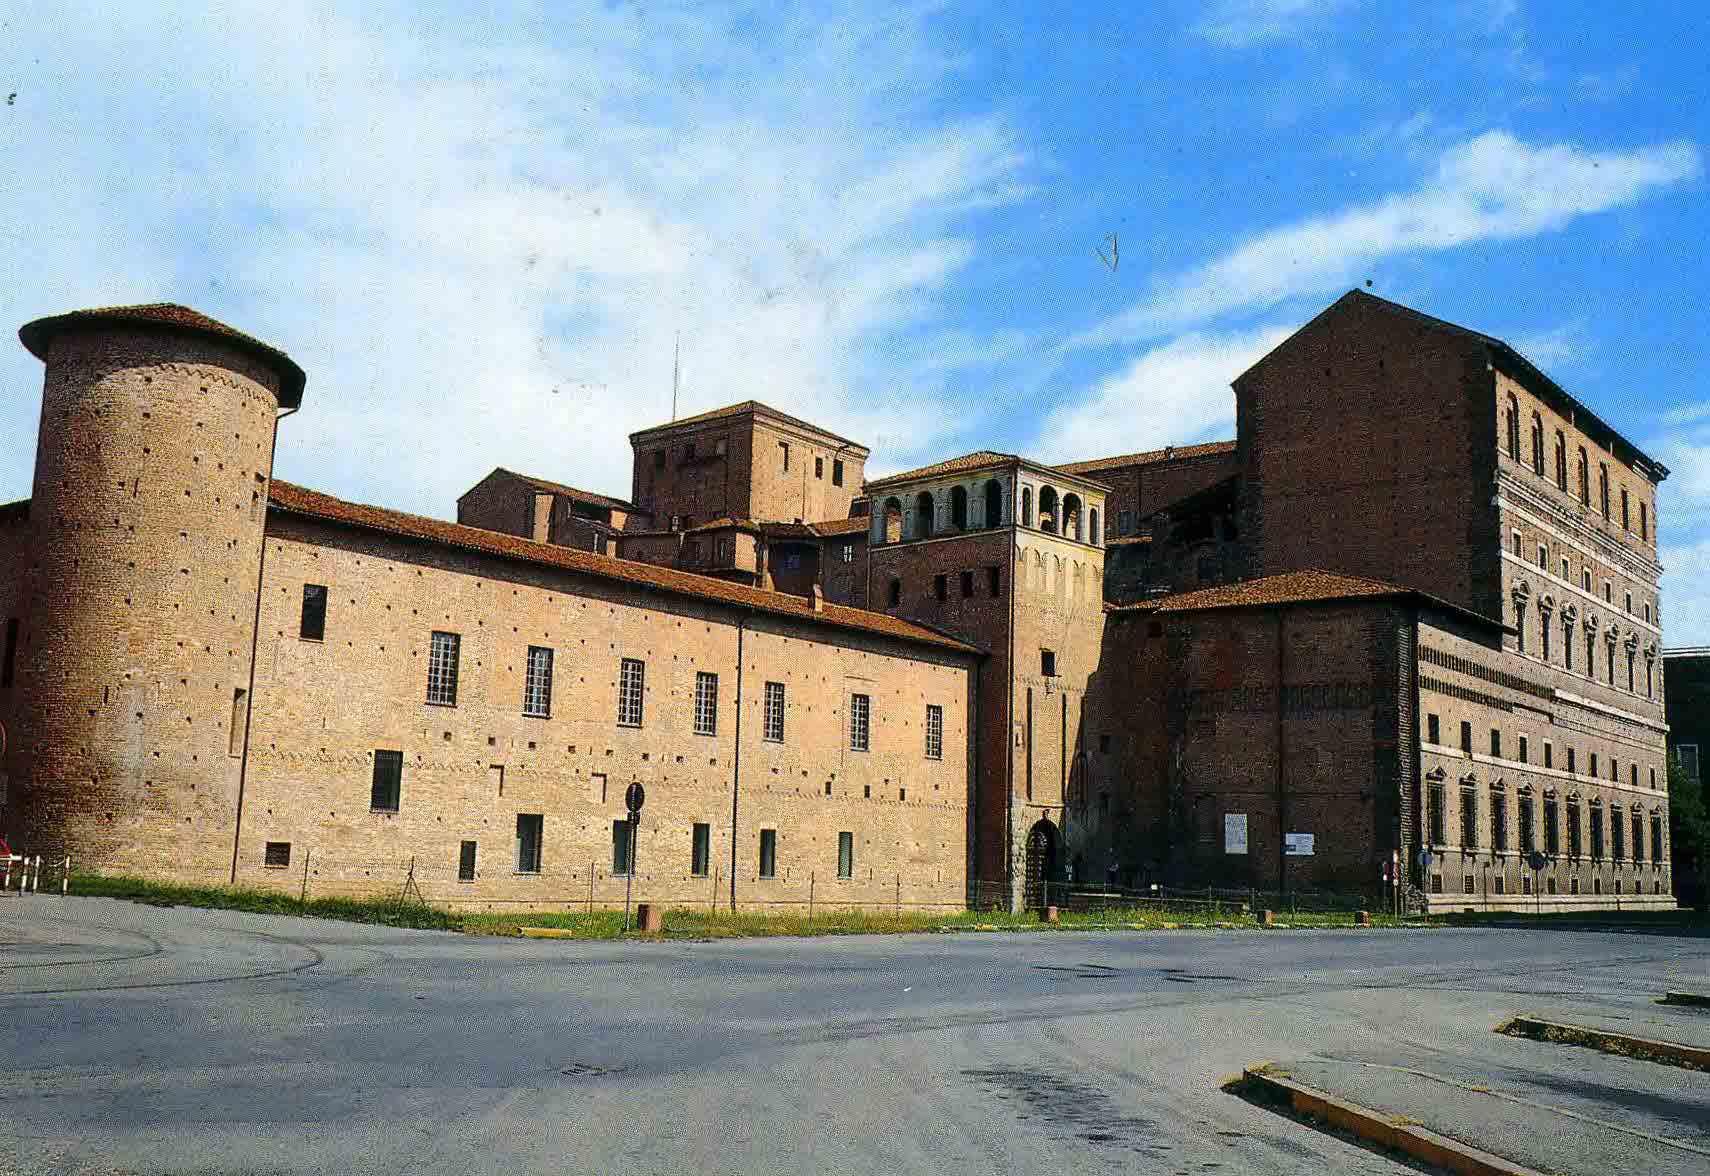 Incontrare Ragazze A Piacenza Usato – buddhahaus-stuttgart.de